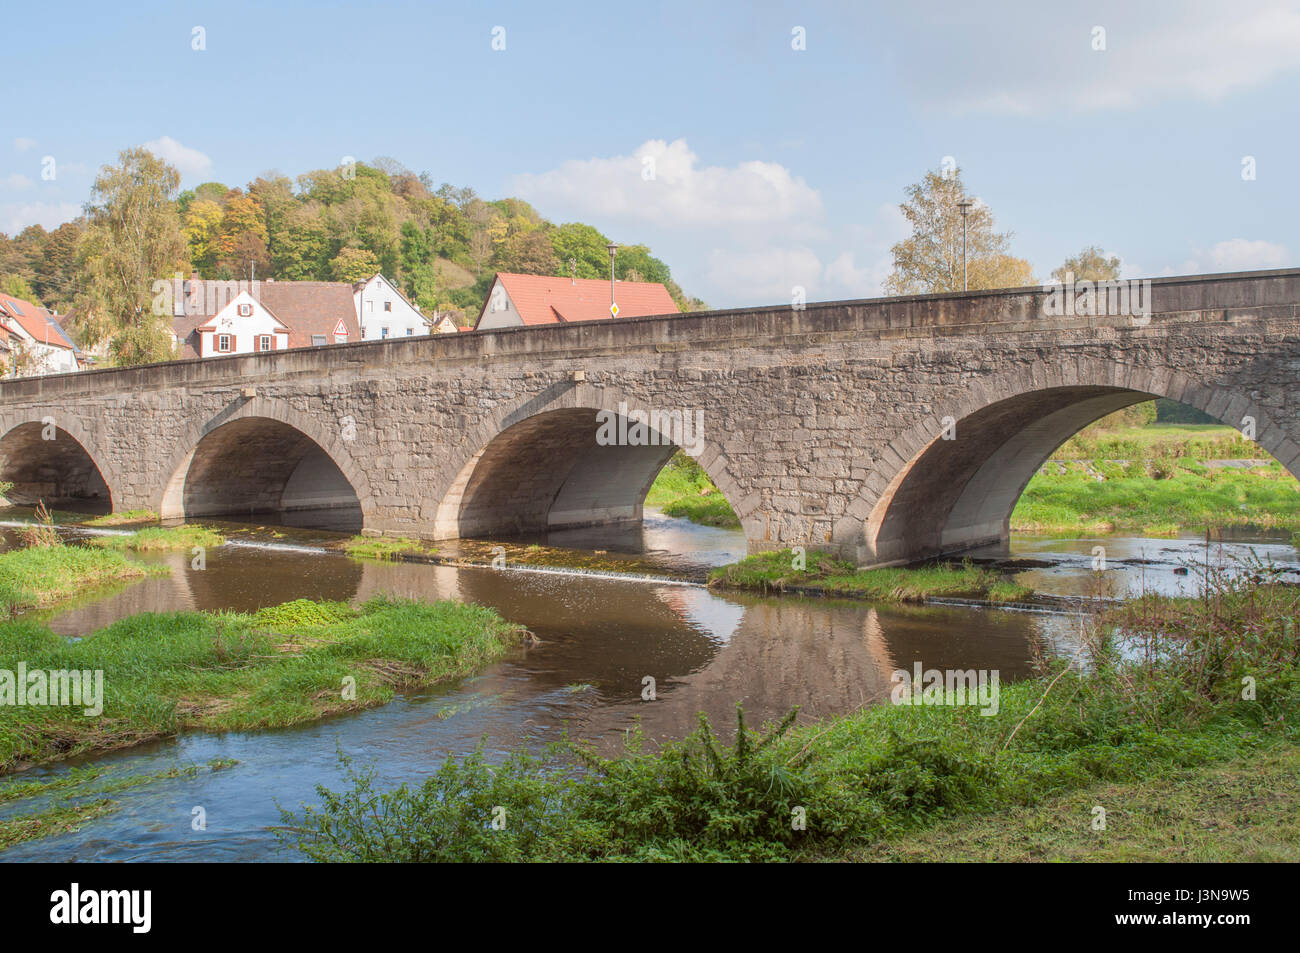 stone bridge, jagst Valley, kirchberg, Schwaebisch Hall, Hohenlohe region, Baden-Wuerttemberg, Heilbronn-Franconia, - Stock Image